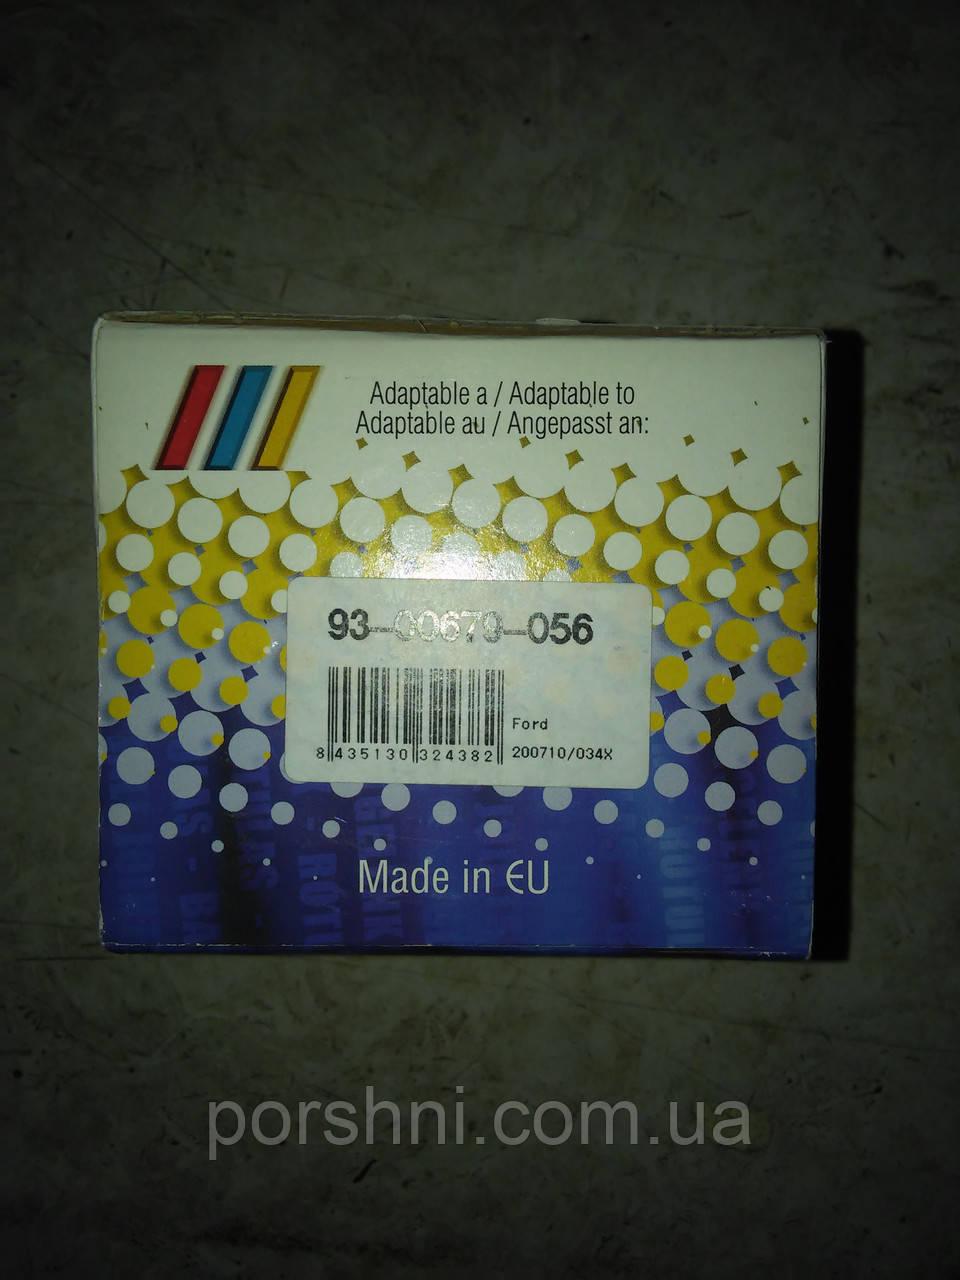 Шаровая Ford Fiesta   FUSION  2001 -- RTS   93.00679+